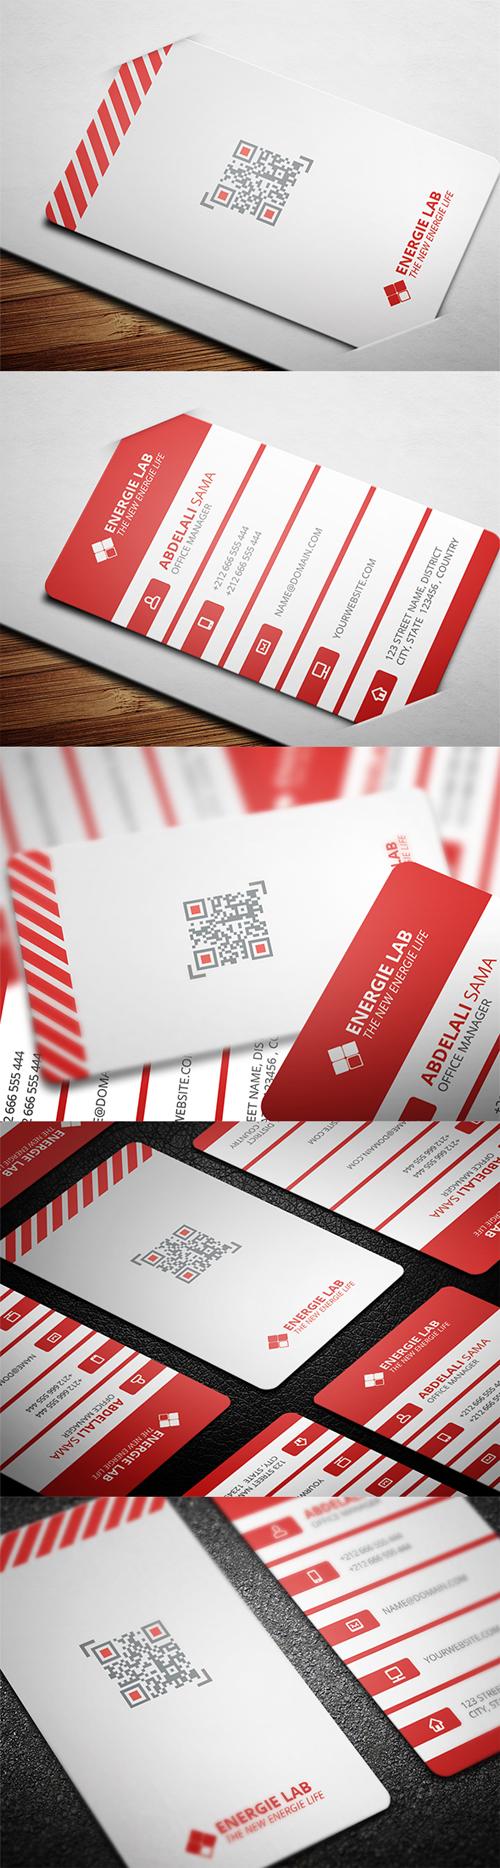 business cards template design - 6